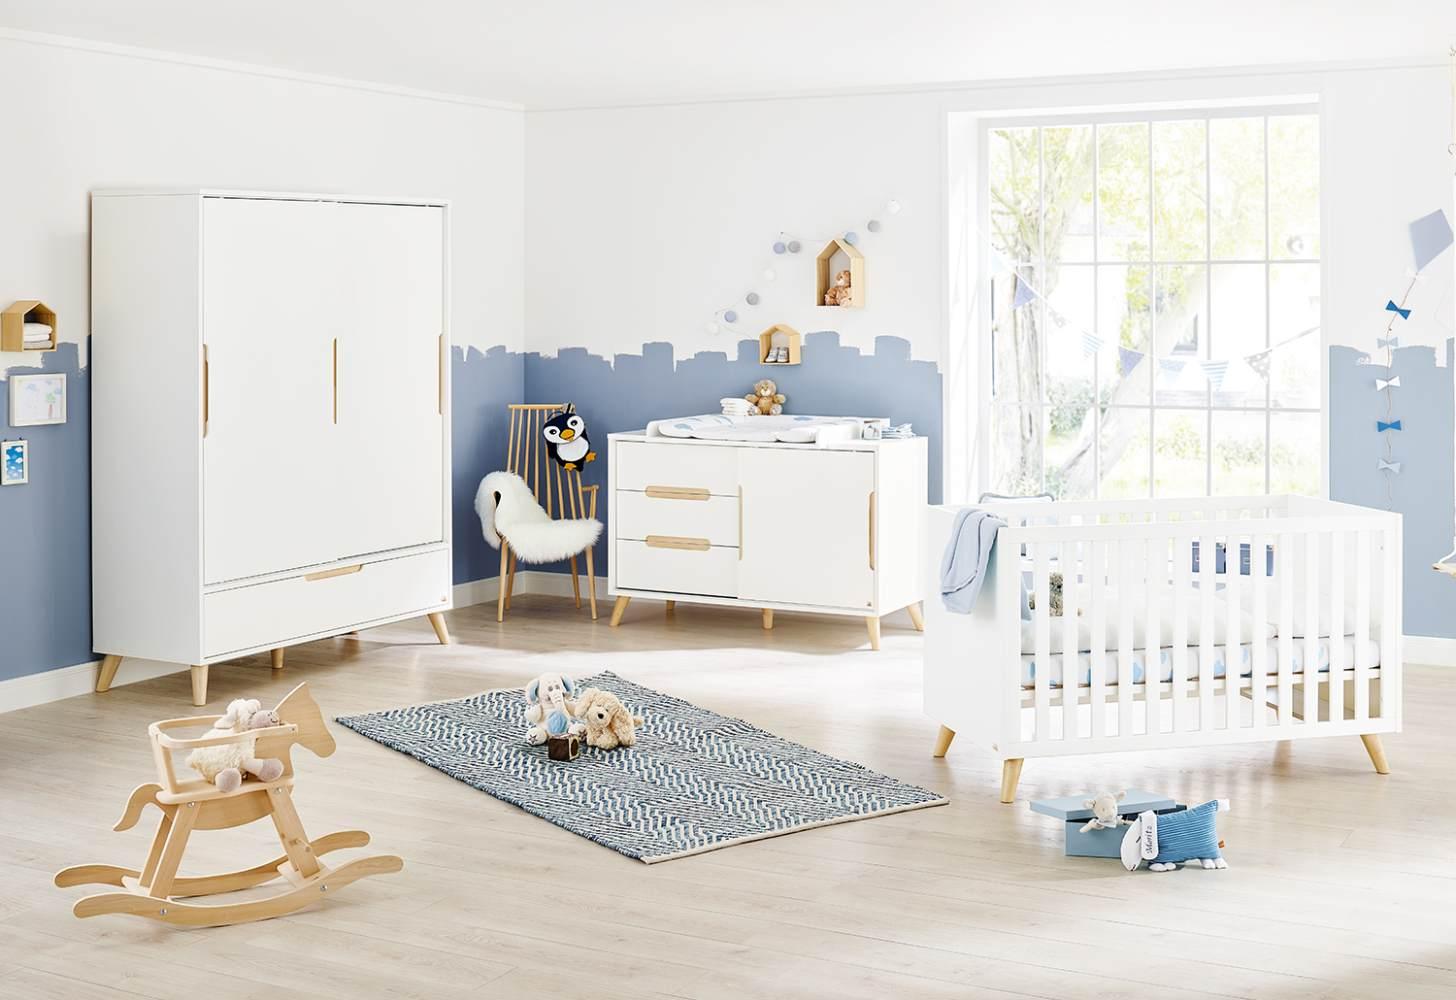 Pinolino 'Move' 3-tlg. Kinderzimmer-Set extrabreit, groß Bild 1